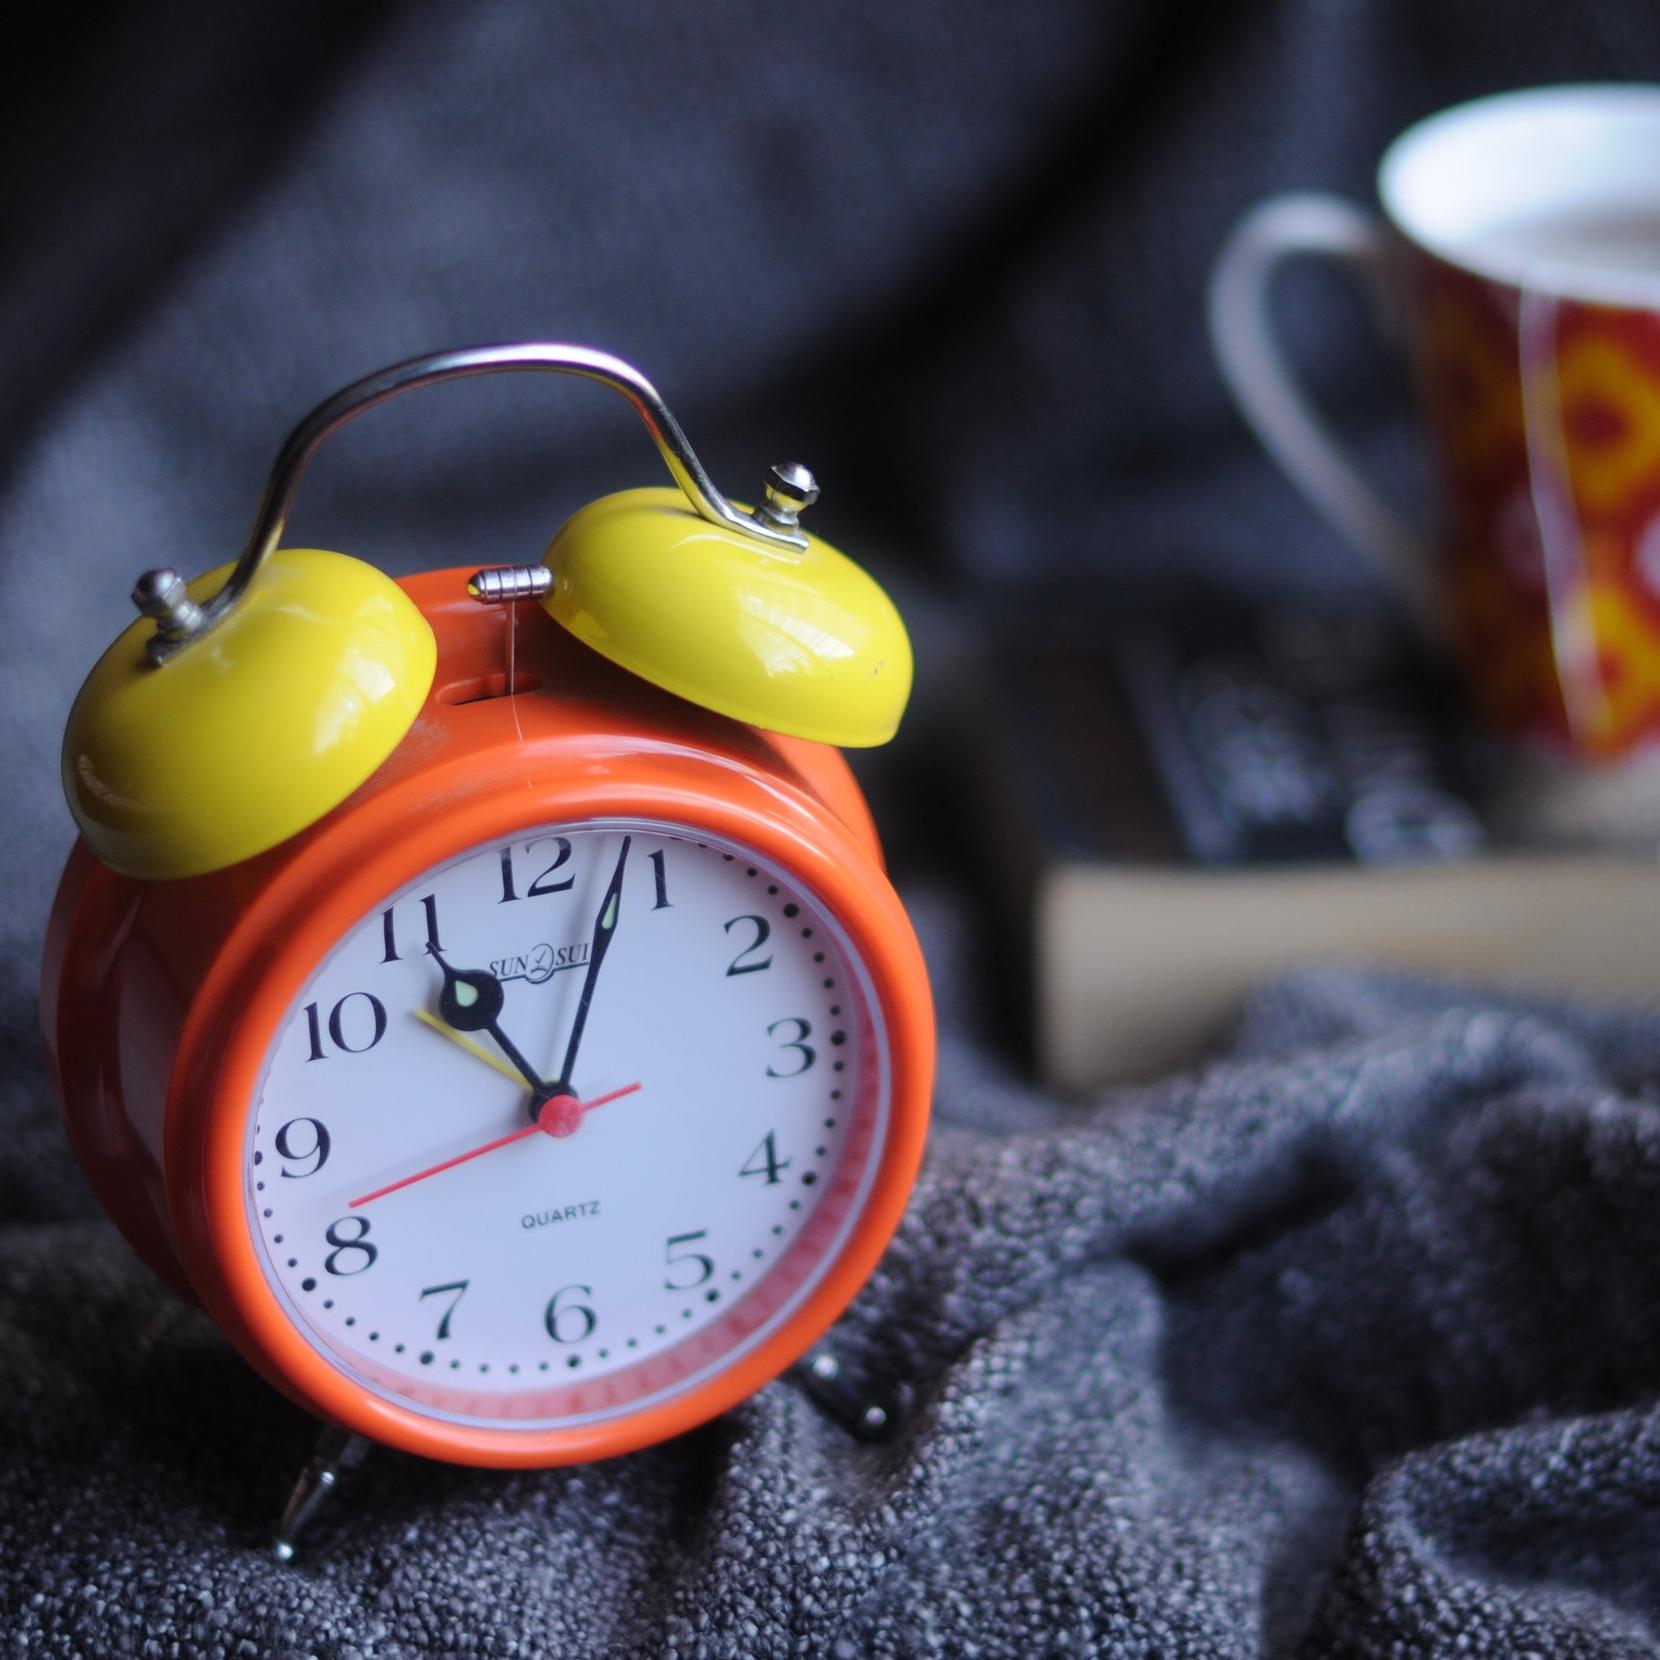 alarm-alarm-clock-analog-714701.jpg